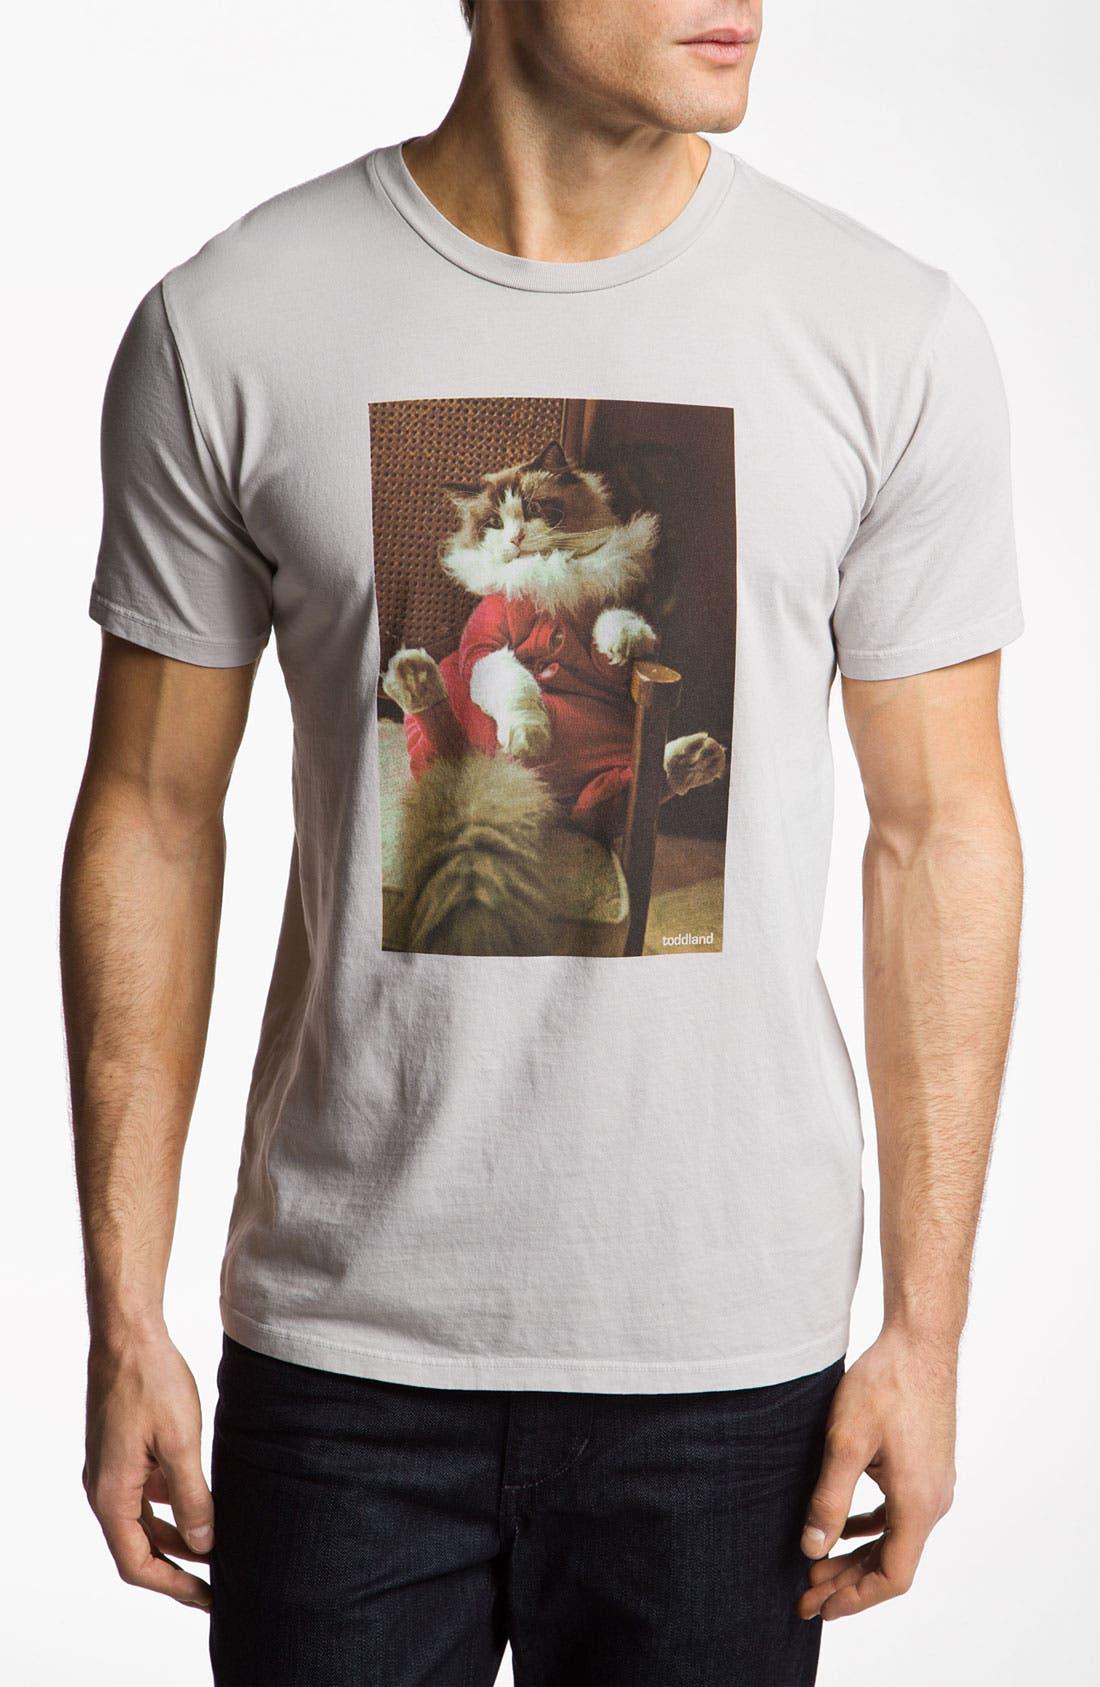 Main Image - Toddland 'Dino's Union Suit' T-Shirt